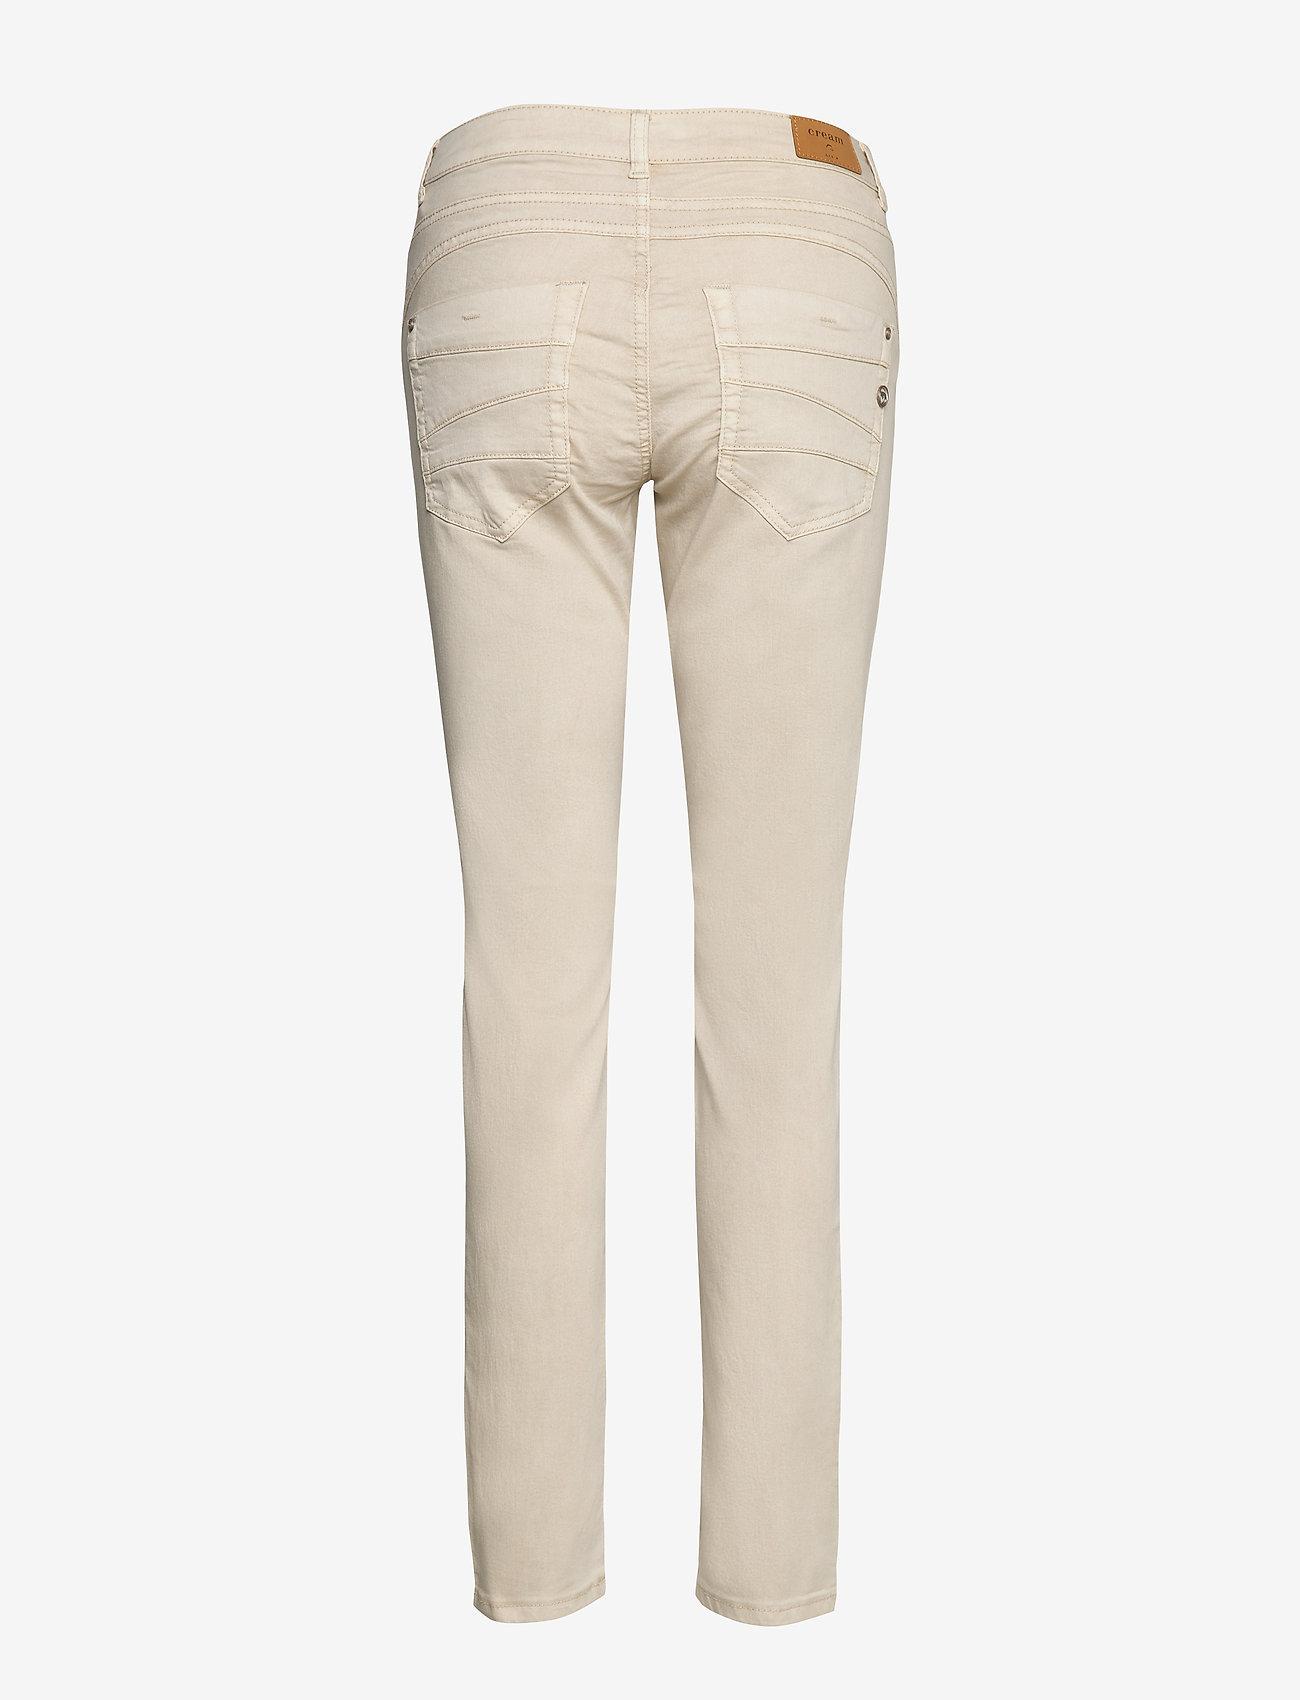 Cream - LotteCR Plain Twill - Coco Fit - skinny jeans - birch - 1